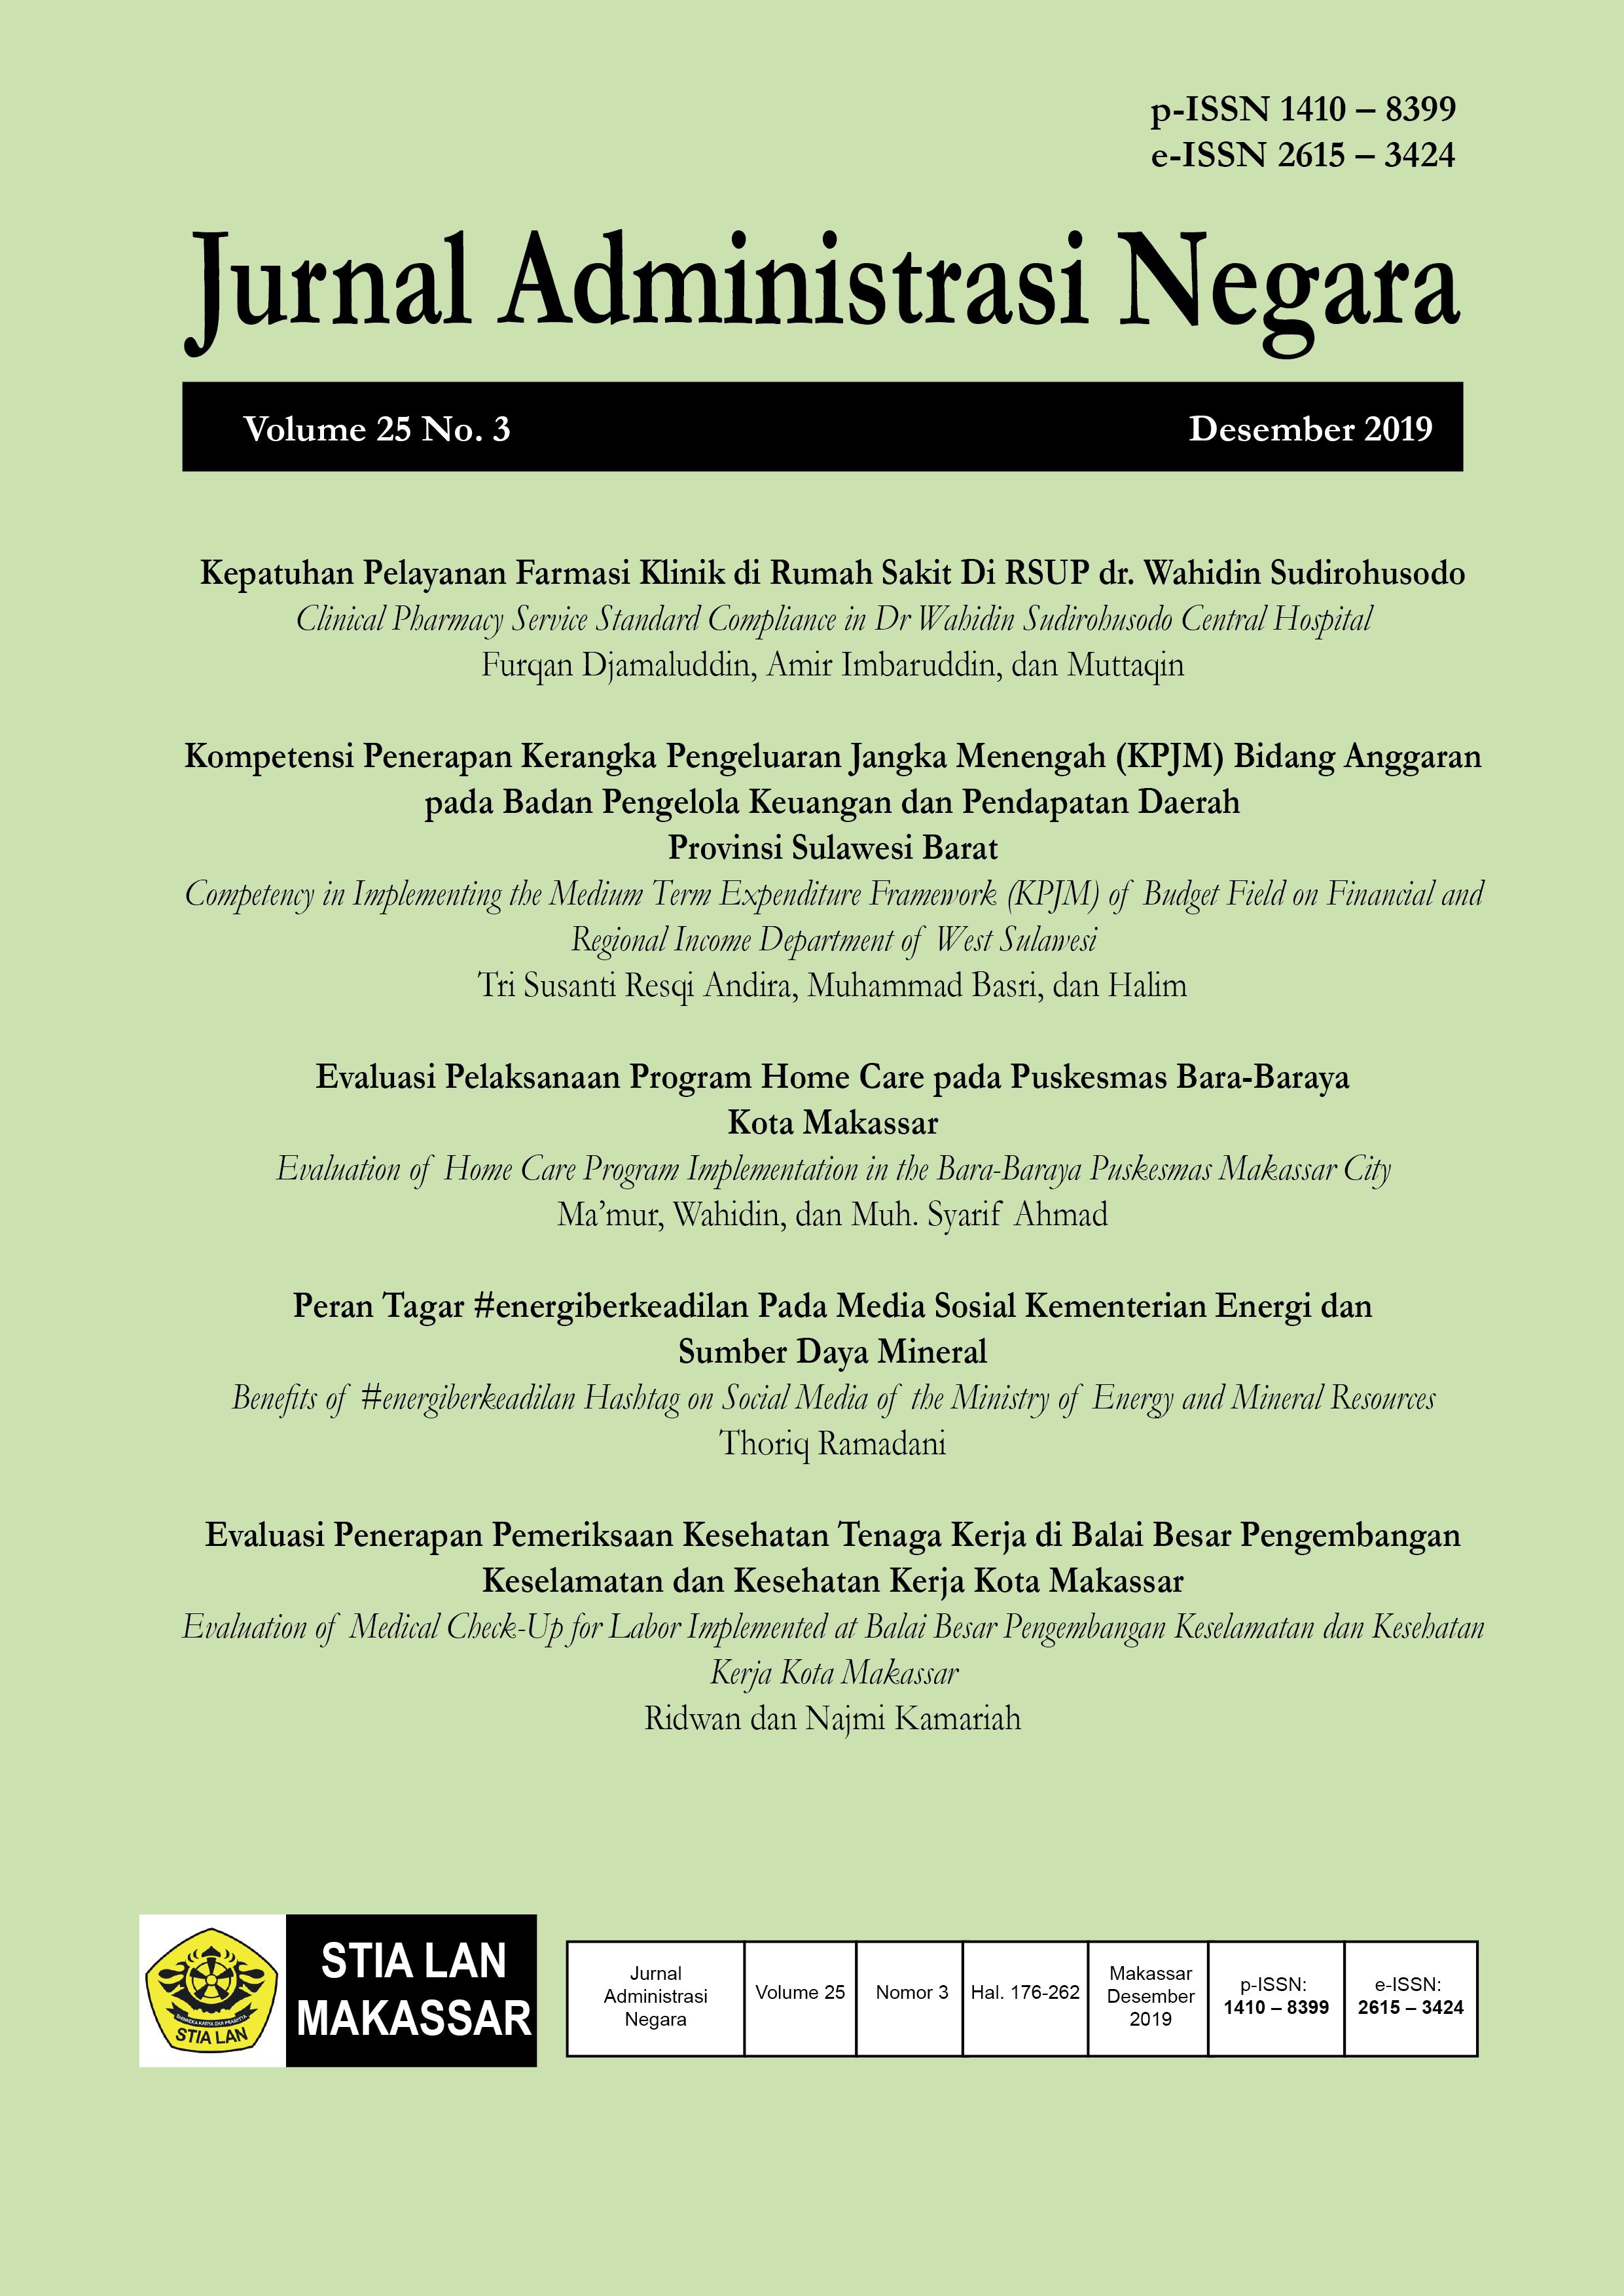 View Vol. 25 No. 3 (2019): Jurnal Administrasi Negara